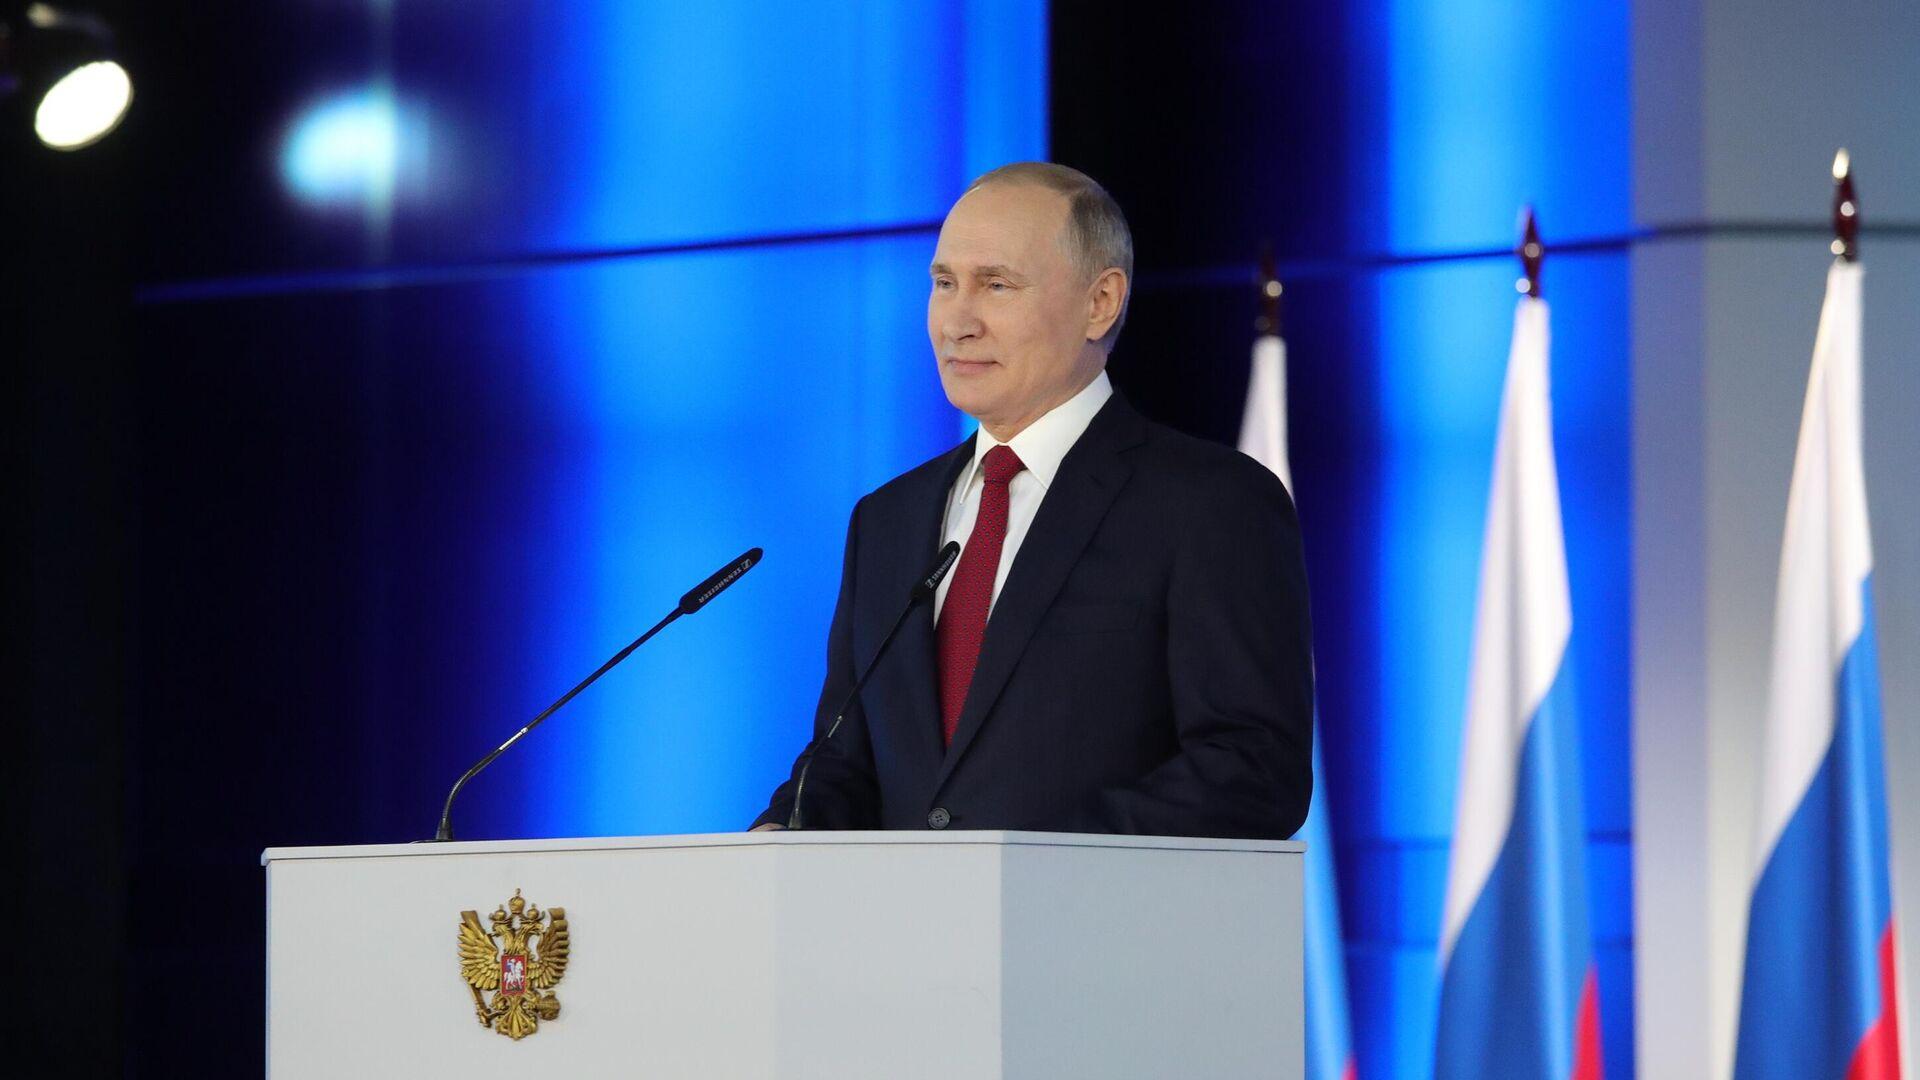 Послание Президента РФ Владимира Путина Федеральному Собранию. Тезисно